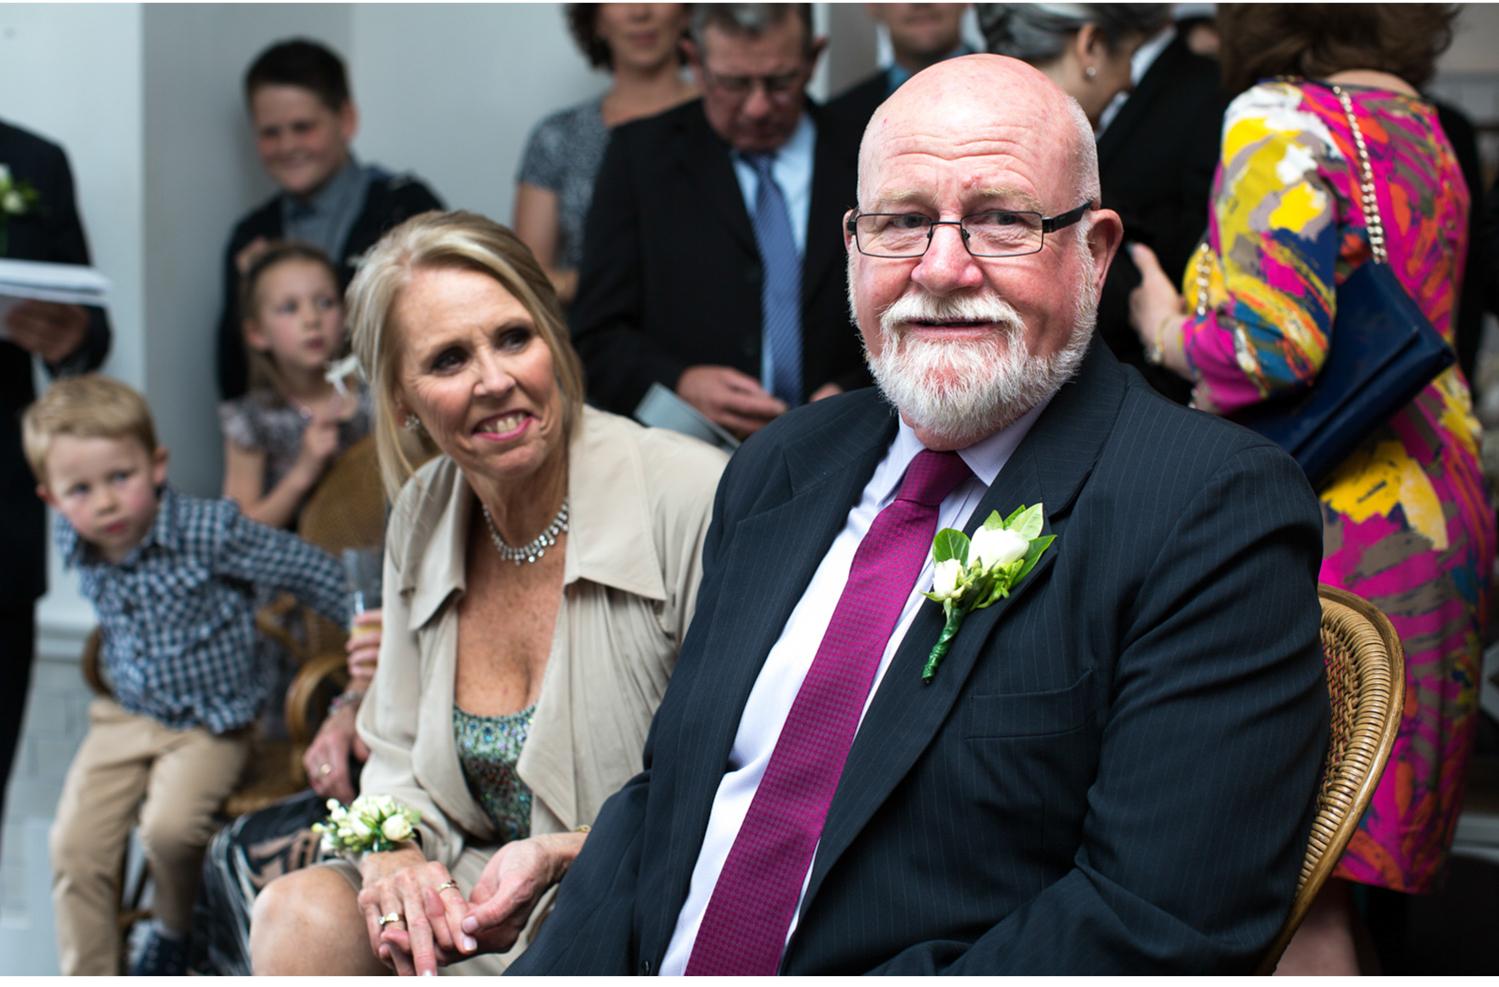 sheridan_nilsson_watsons_bay_wedding.46.jpg